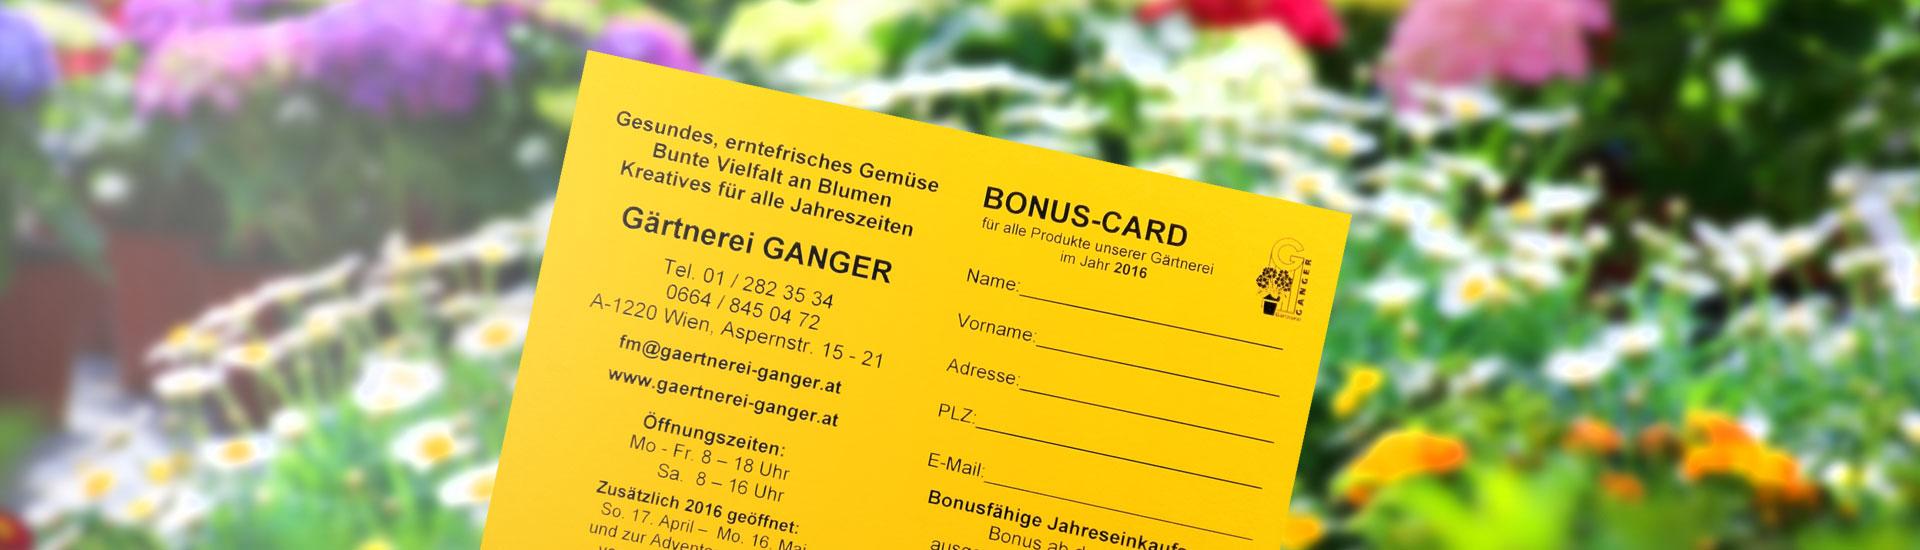 Gärtnerei Ganger | Bonuscard